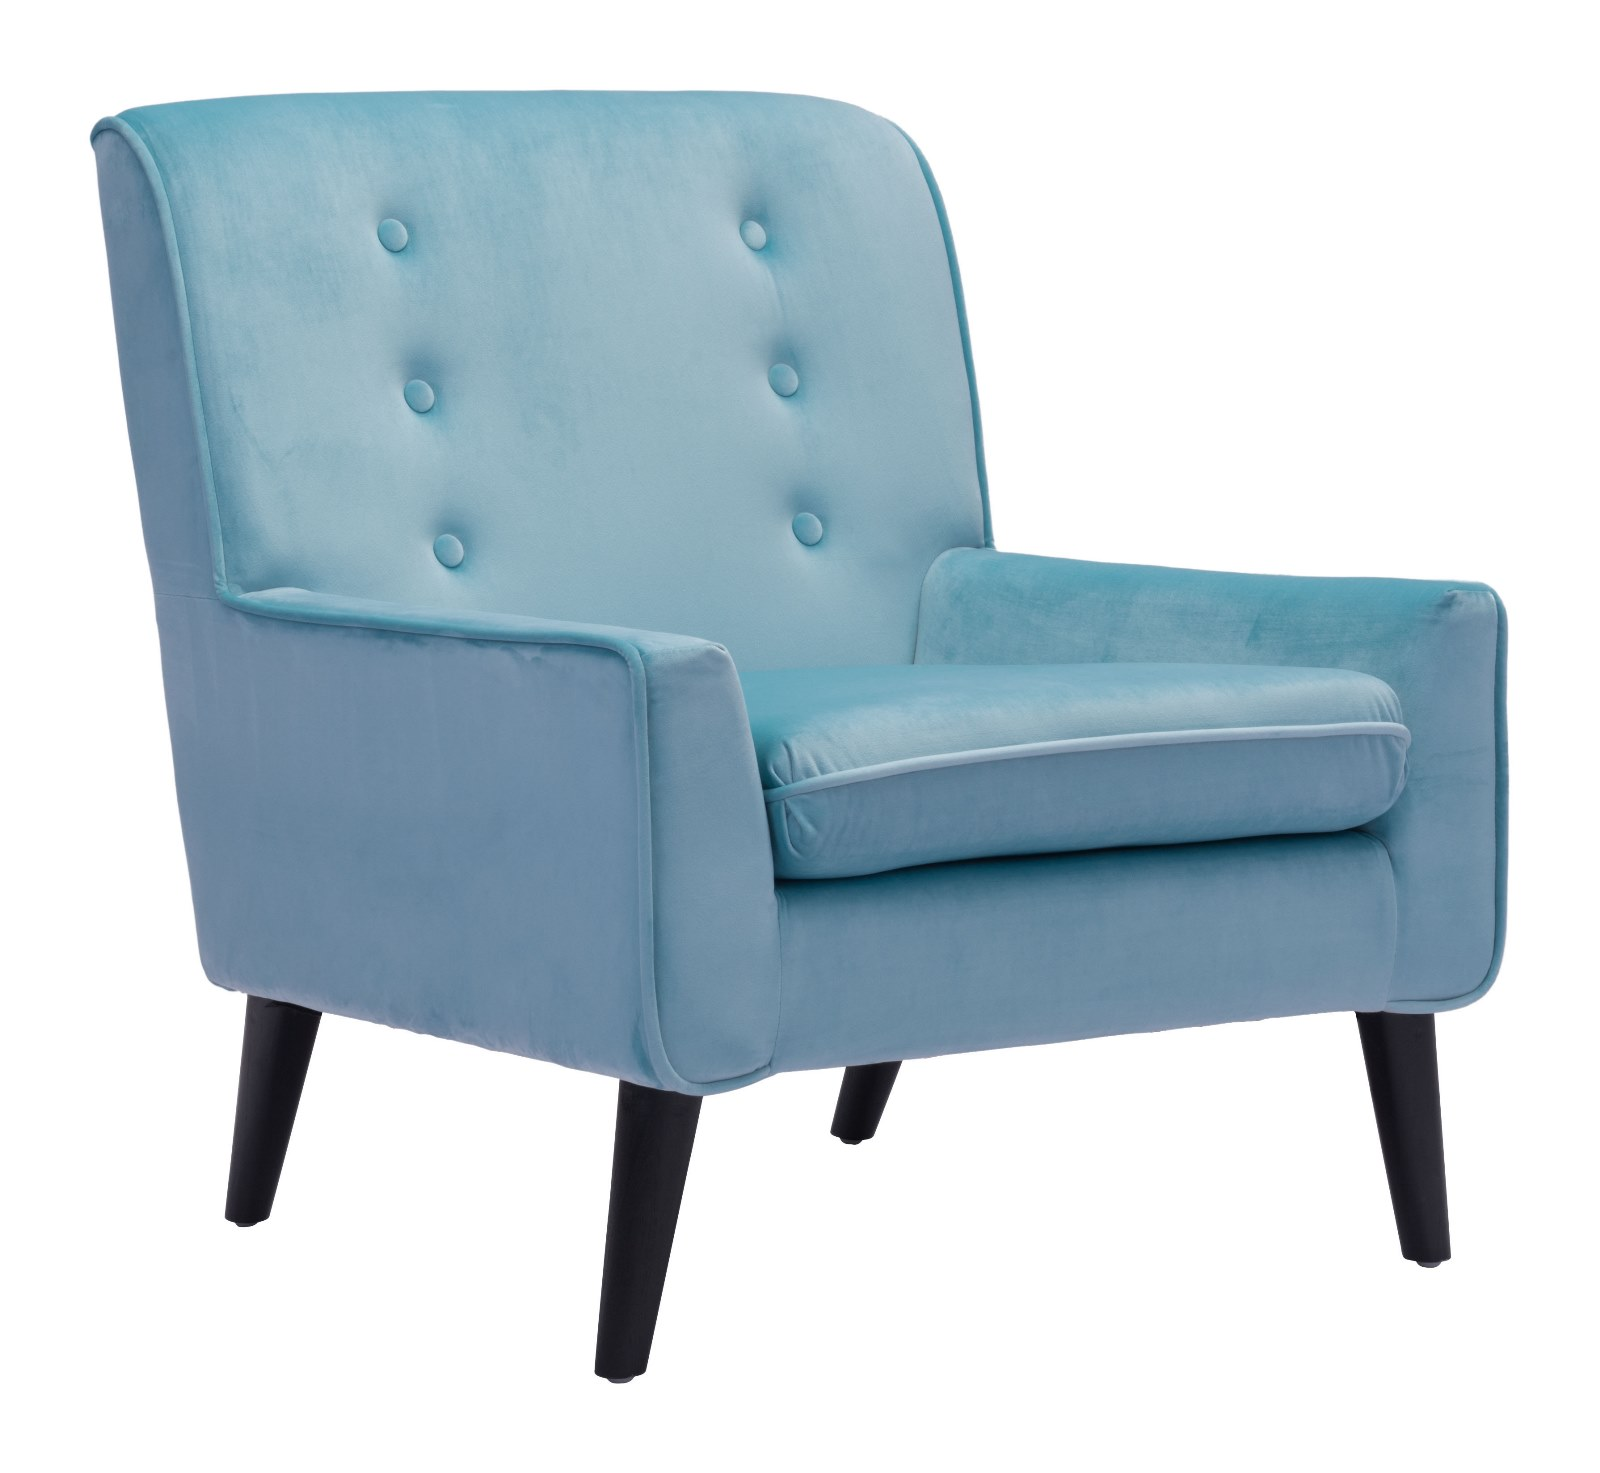 Rollins Modern Arm Chair Blue: Modern Contemporary Arm Chair, Blue, Fabric